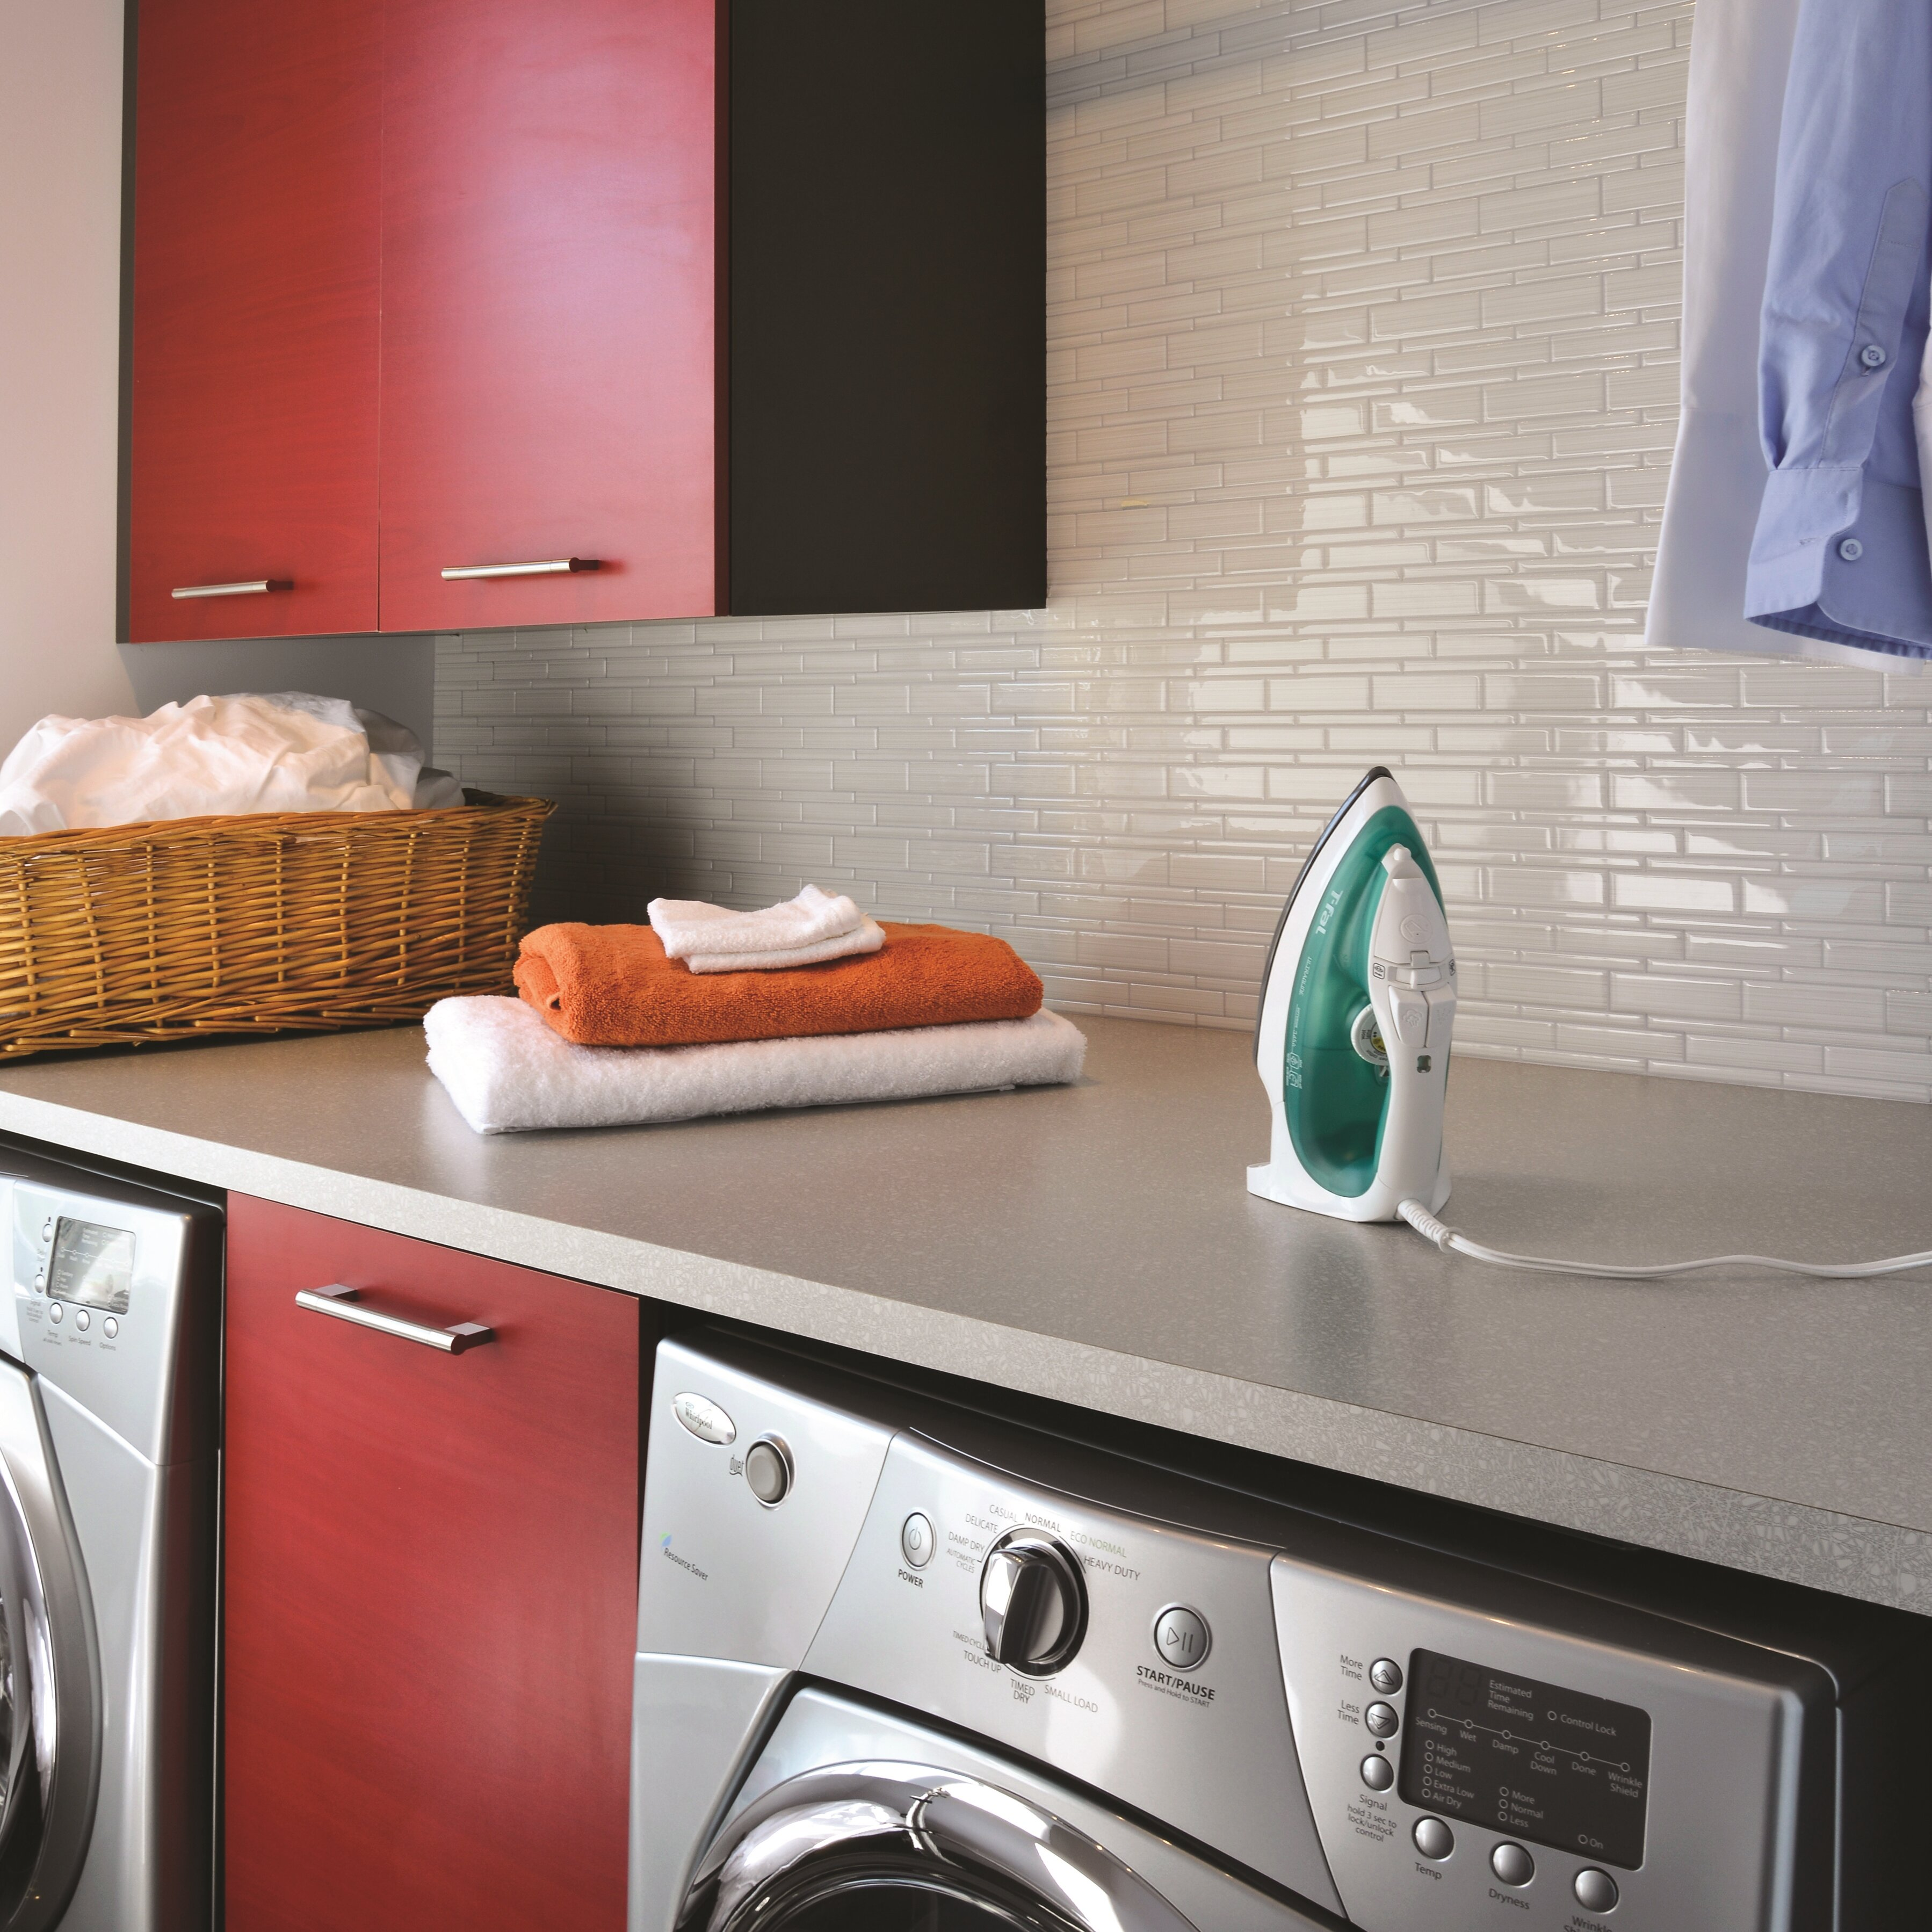 "Self Adhesive Backsplashes Pictures Ideas From Hgtv: Smart Tiles Mosaik Infinity Blanco 10.51"" X 9.71"" Peel"